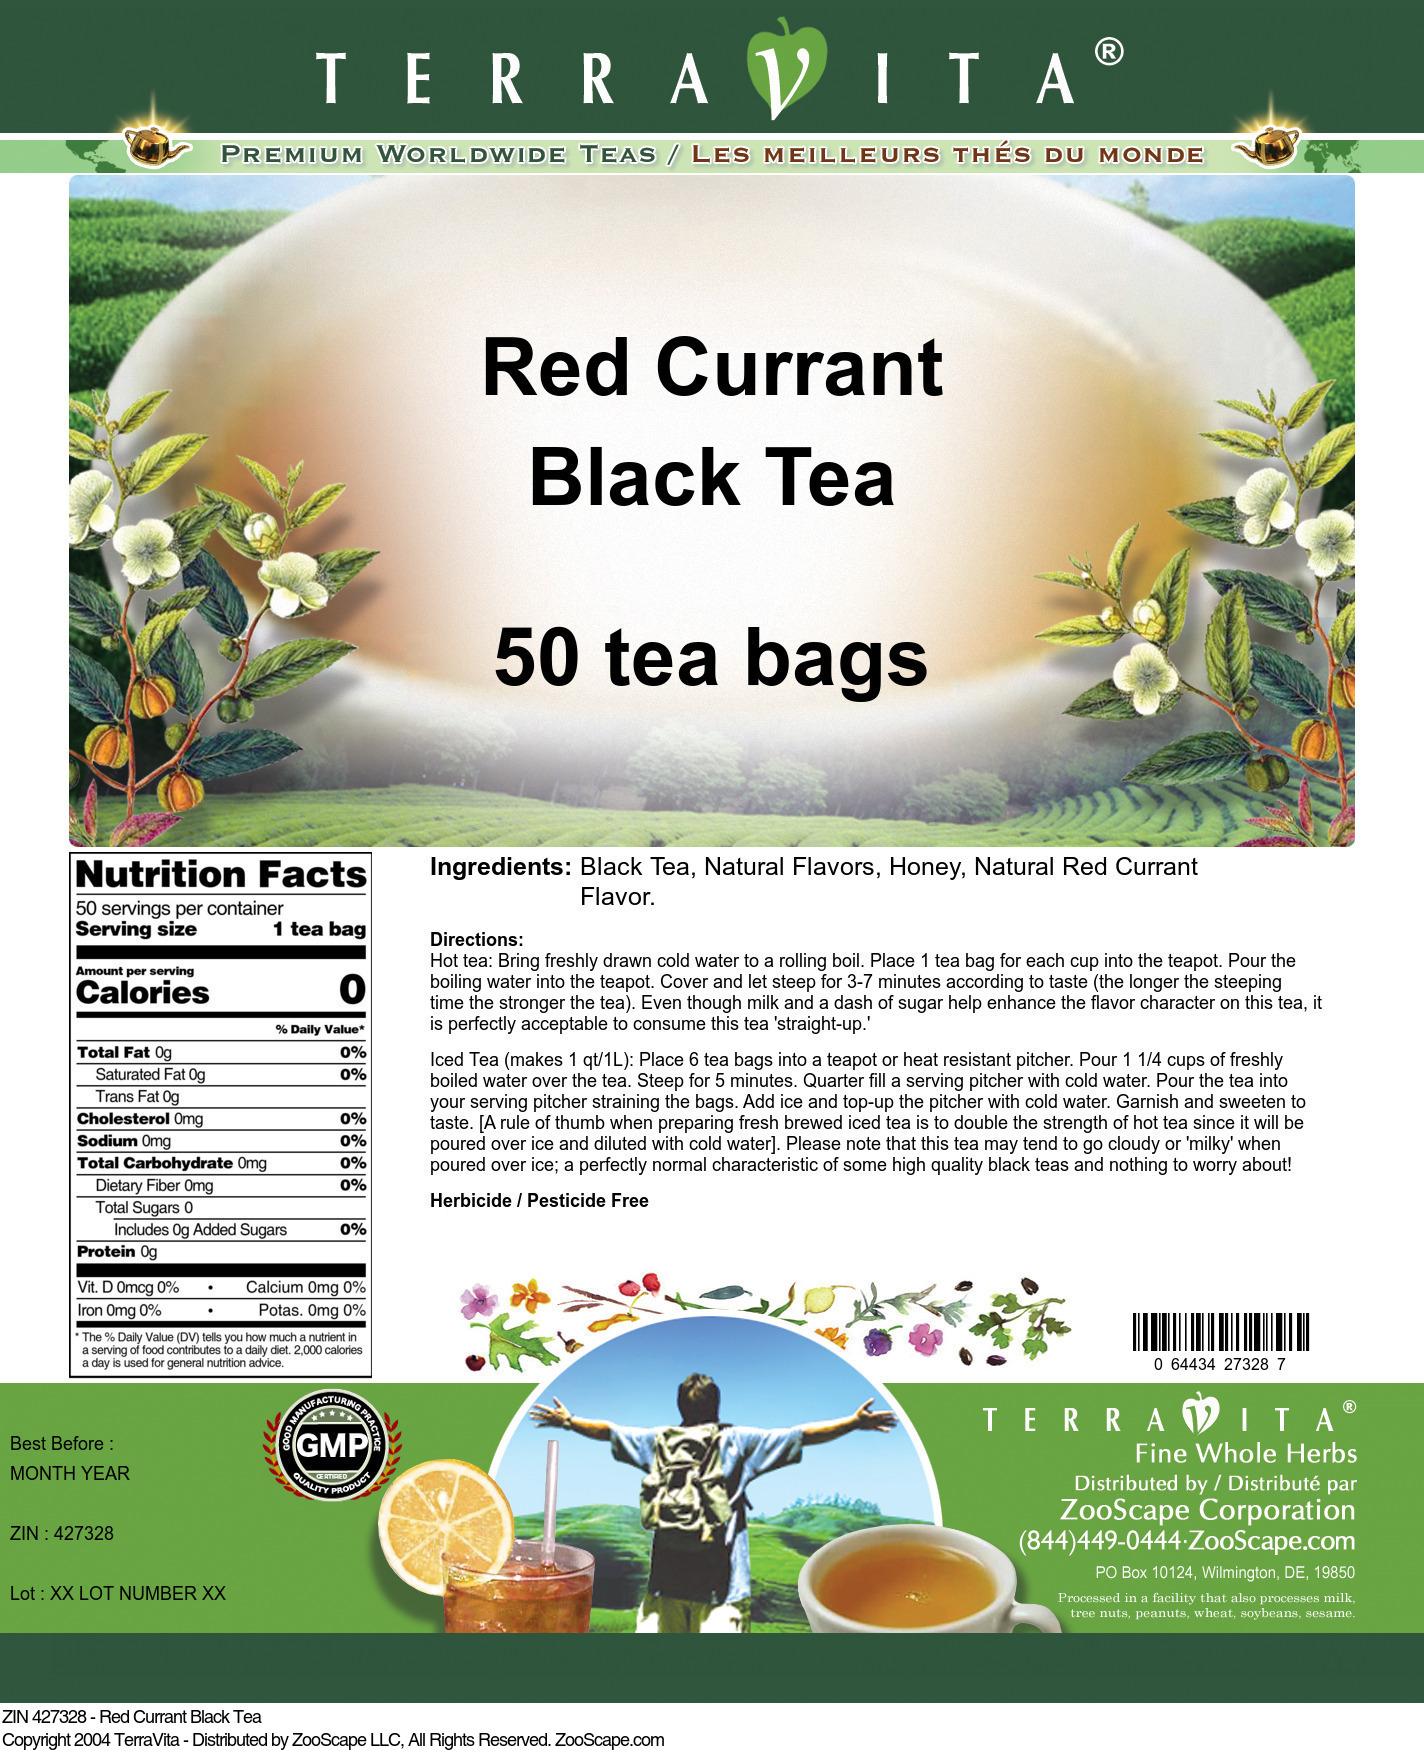 Red Currant Black Tea